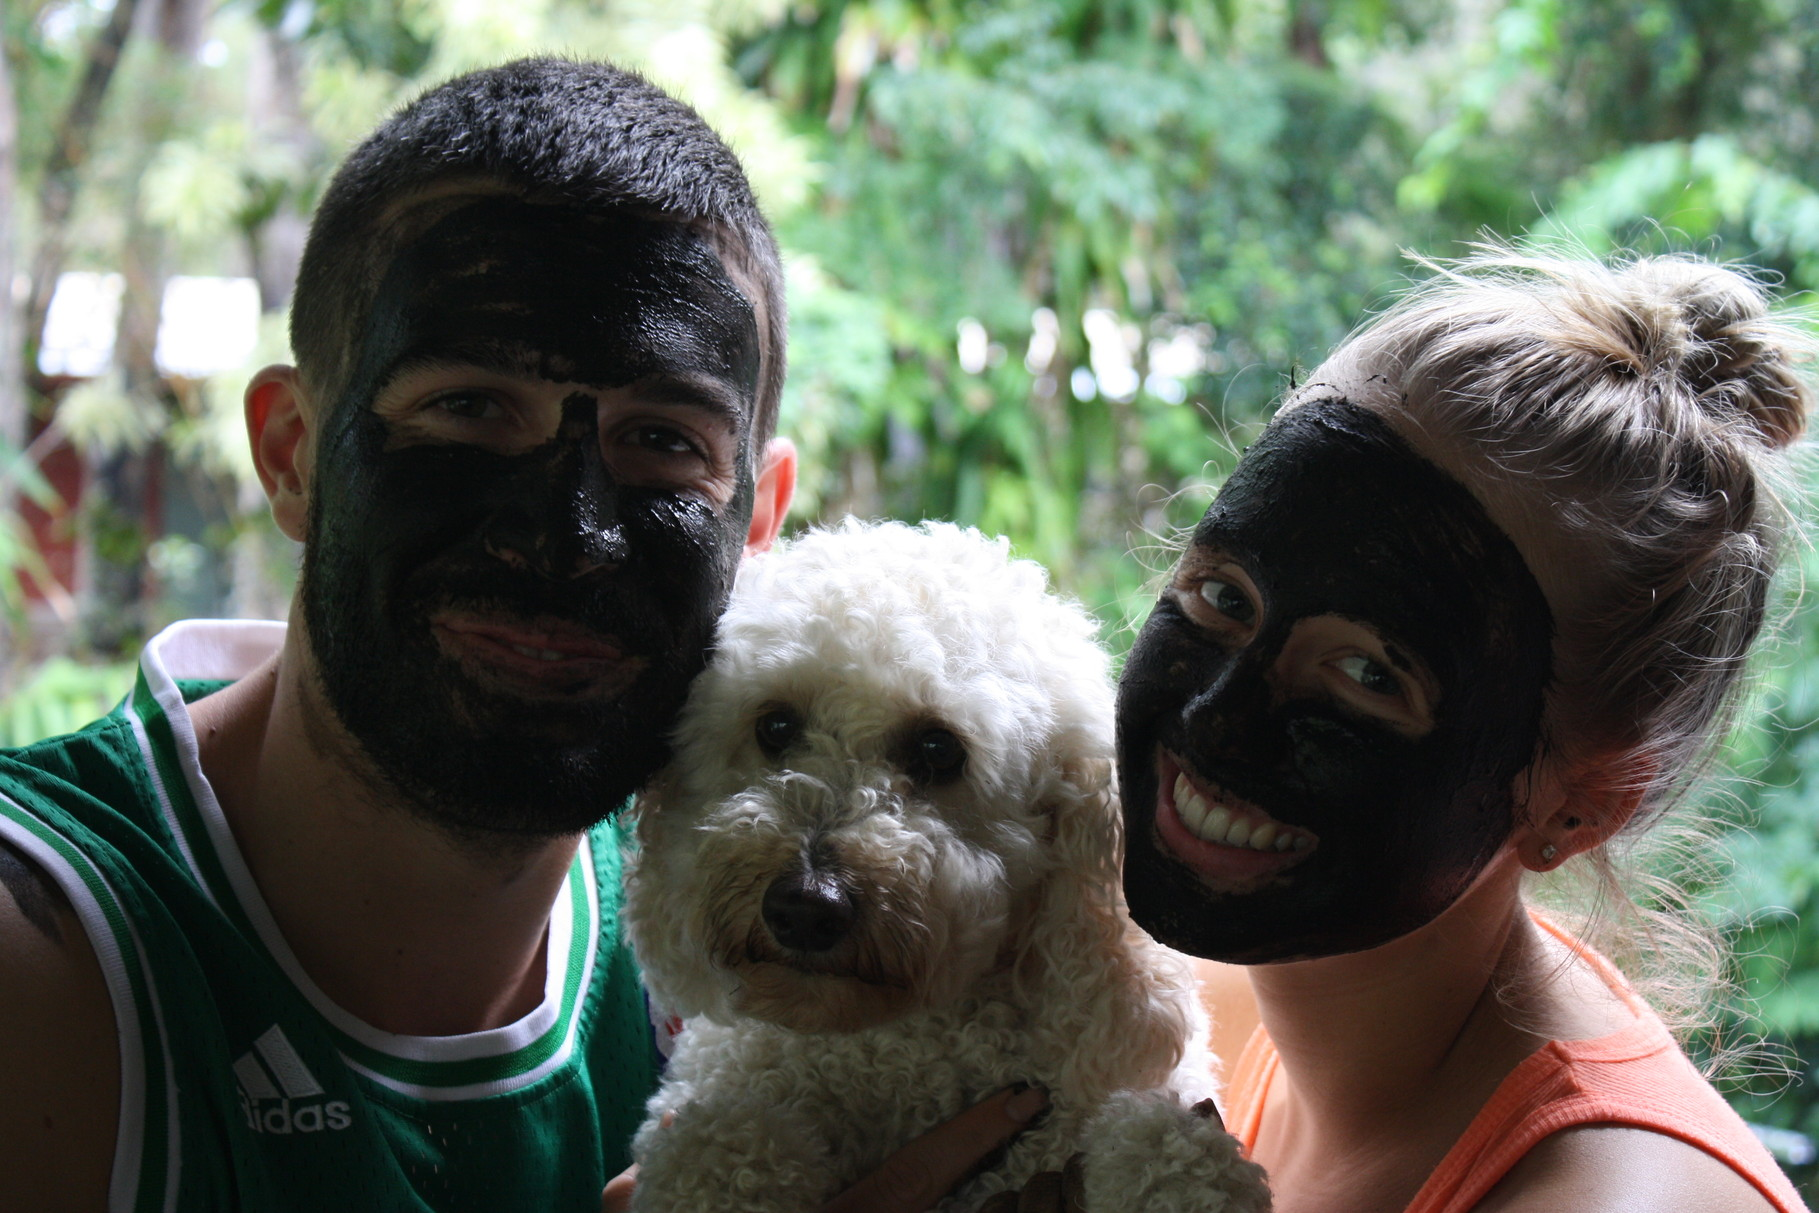 BUY RYL Moor Mud Mask Blackhead & Pore Reducer